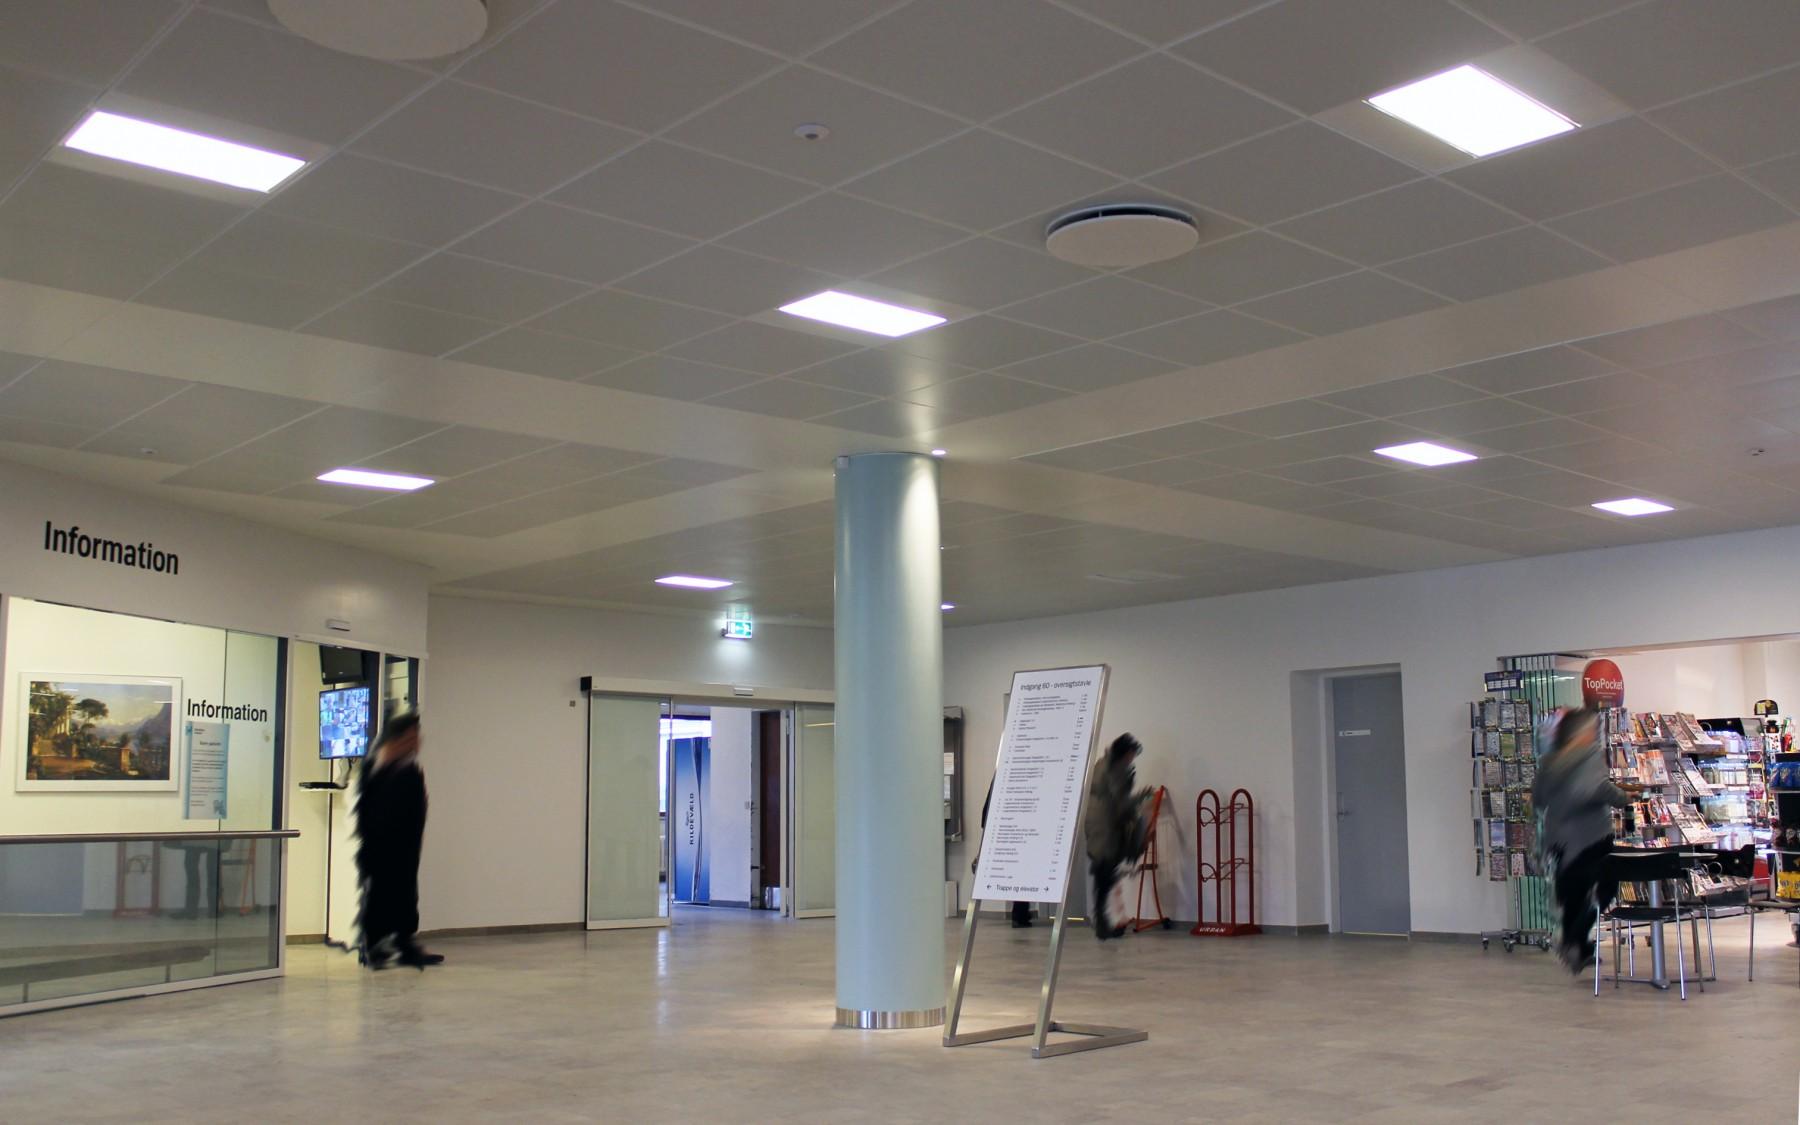 Bispebjerg_hospital - DAMPA Clip-in bevelled edge